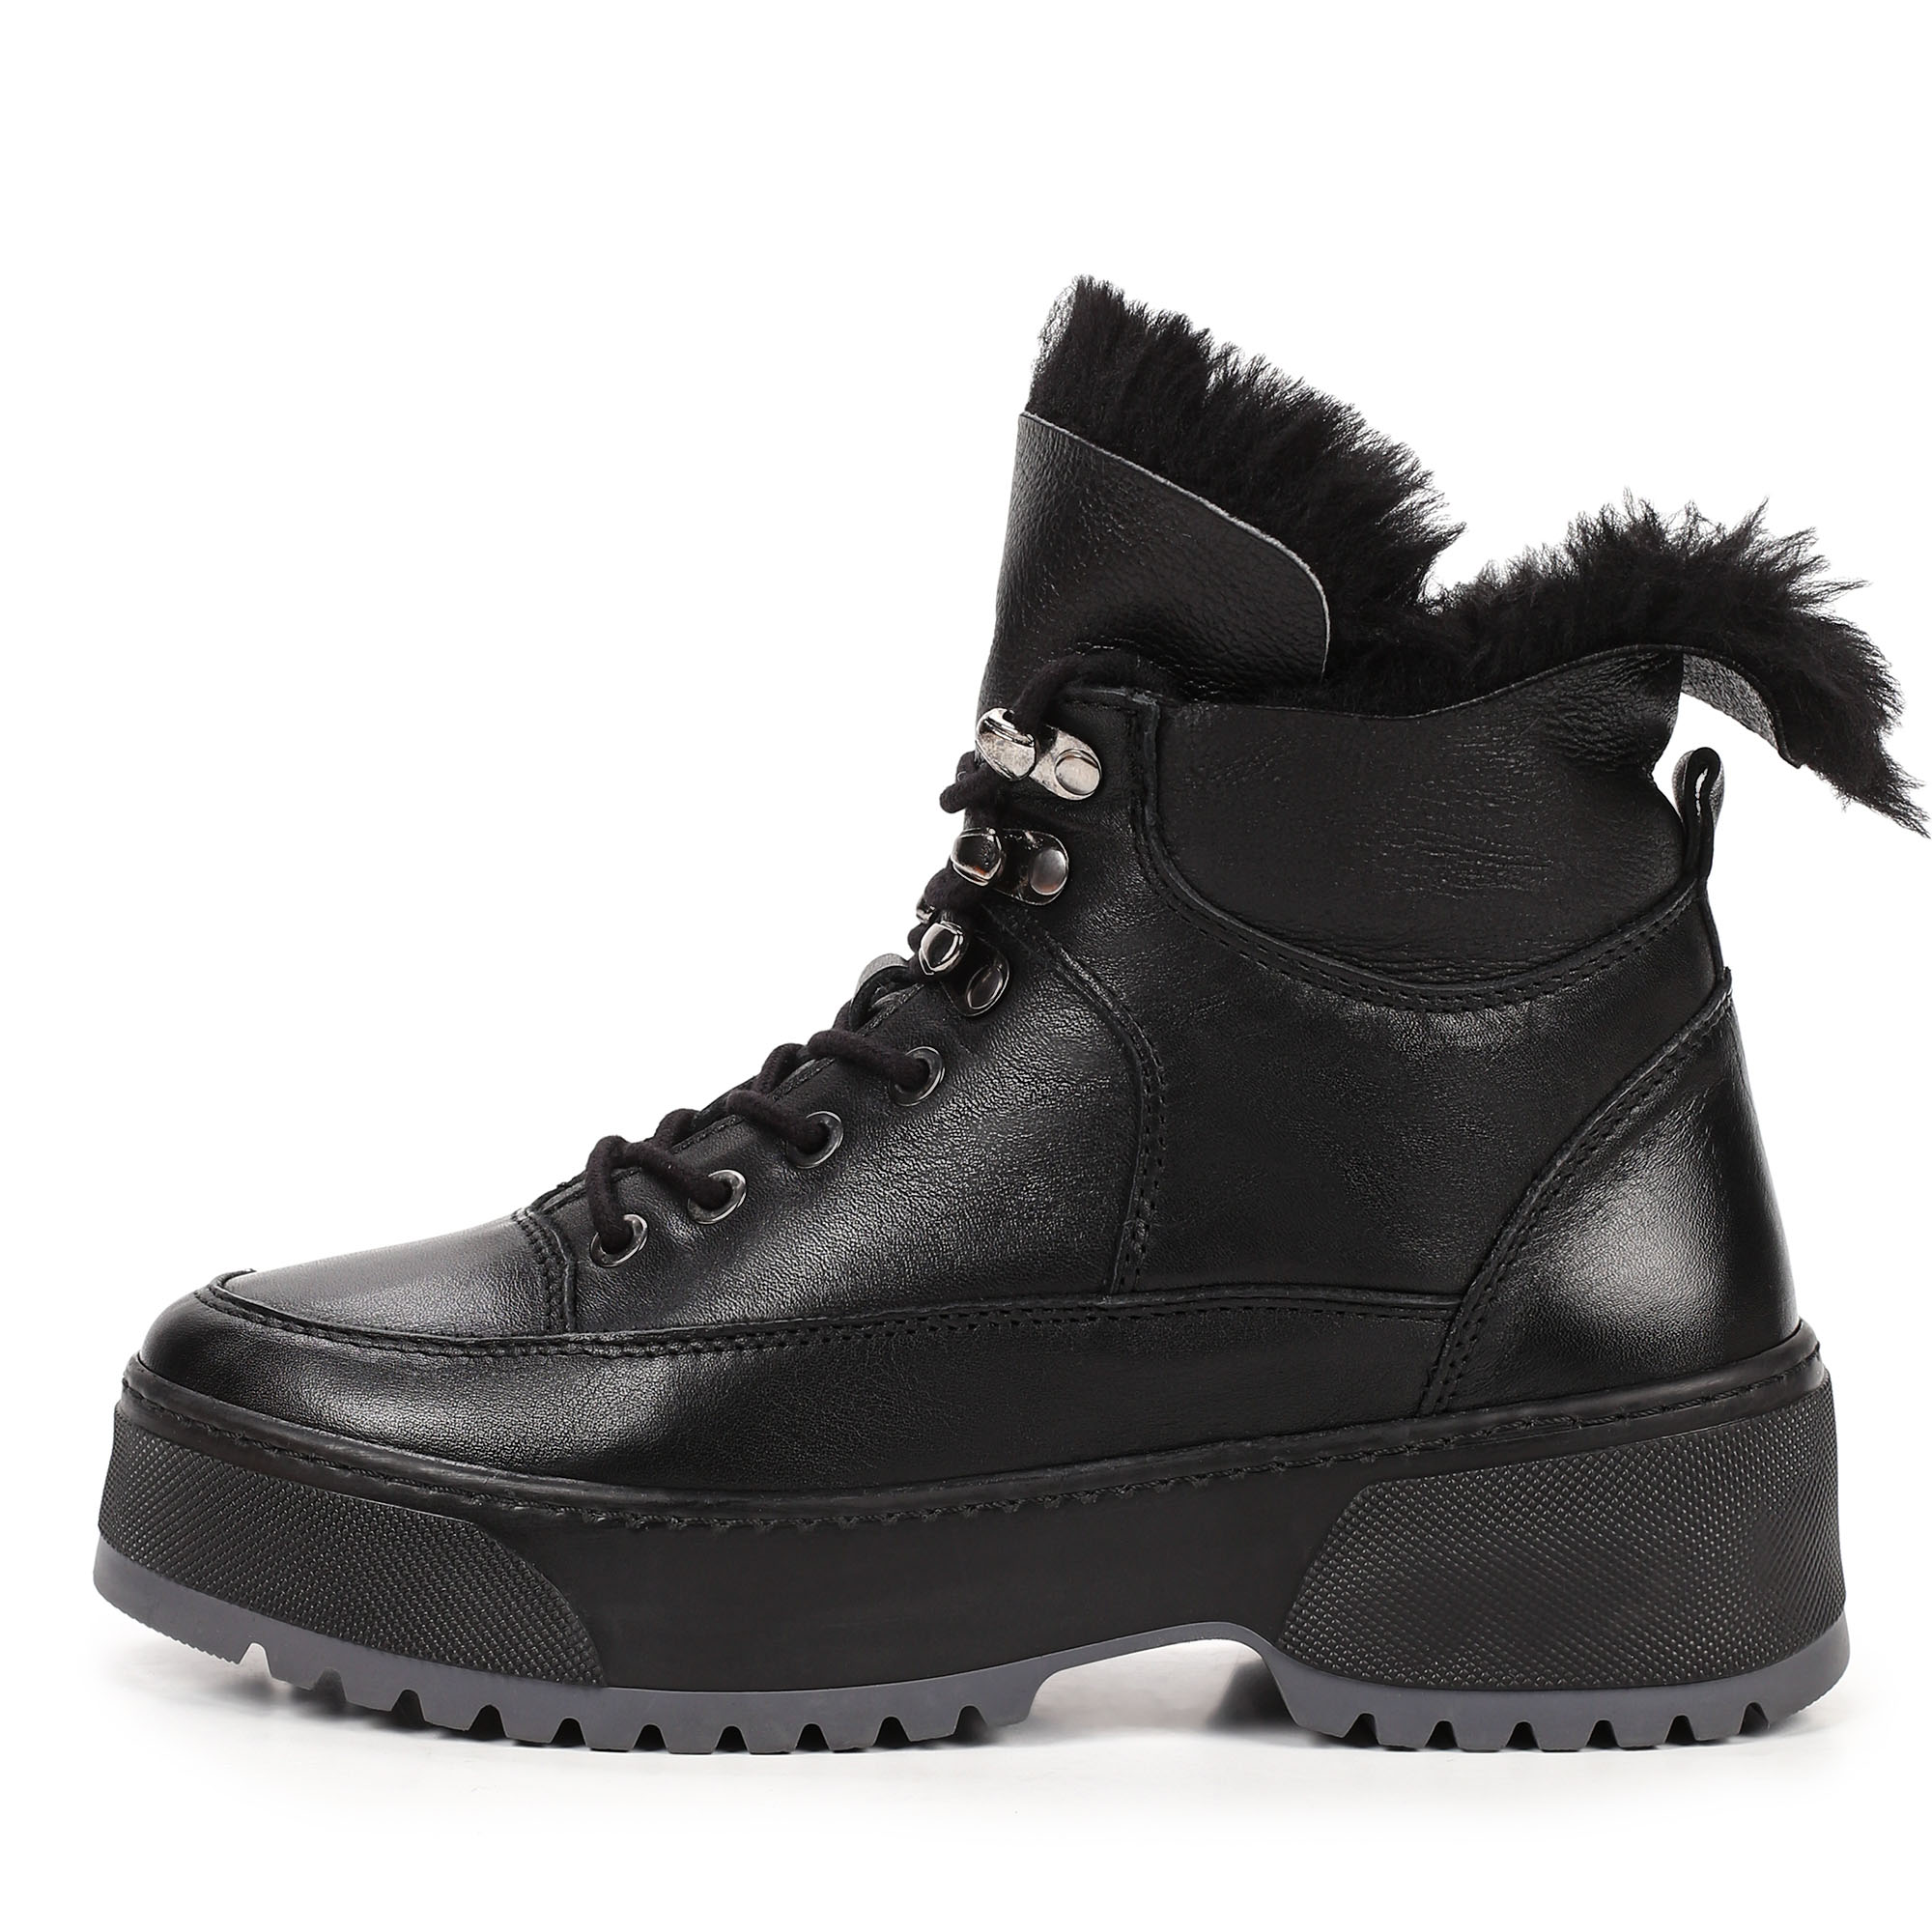 Ботинки Thomas Munz 505-077A-3102